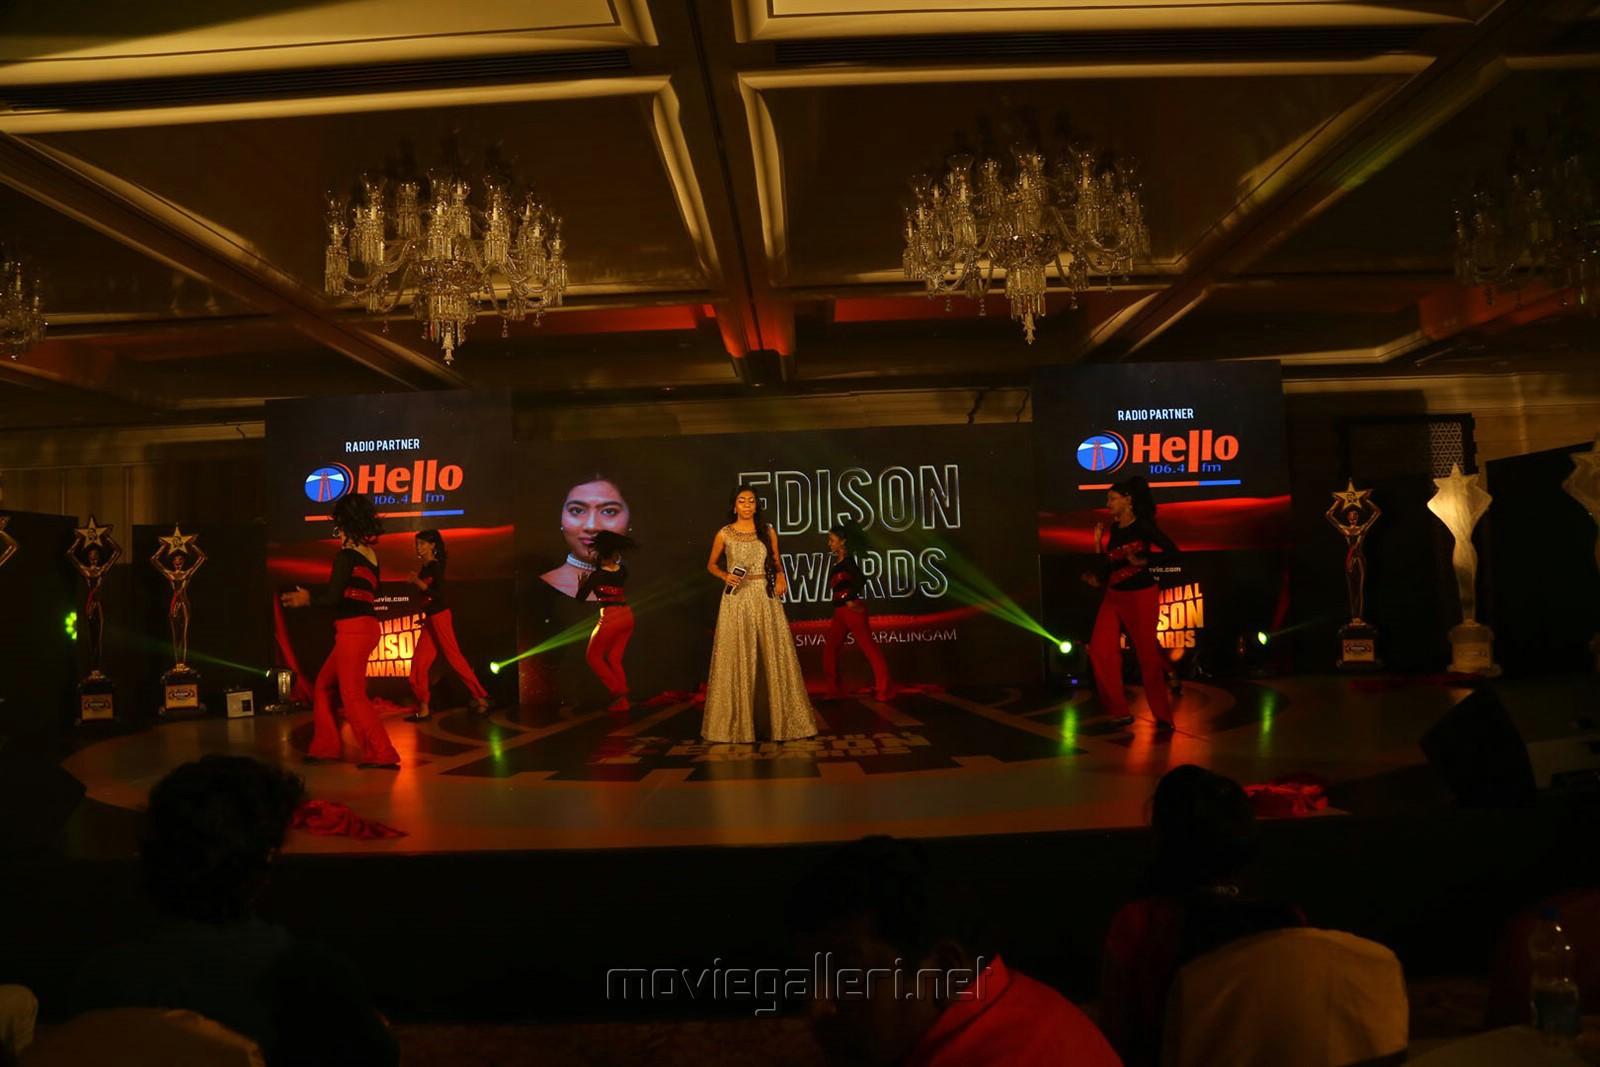 Singer Luksimi Sivaneswaralingam @ 11th Annual Edison Awards 2018 Stills